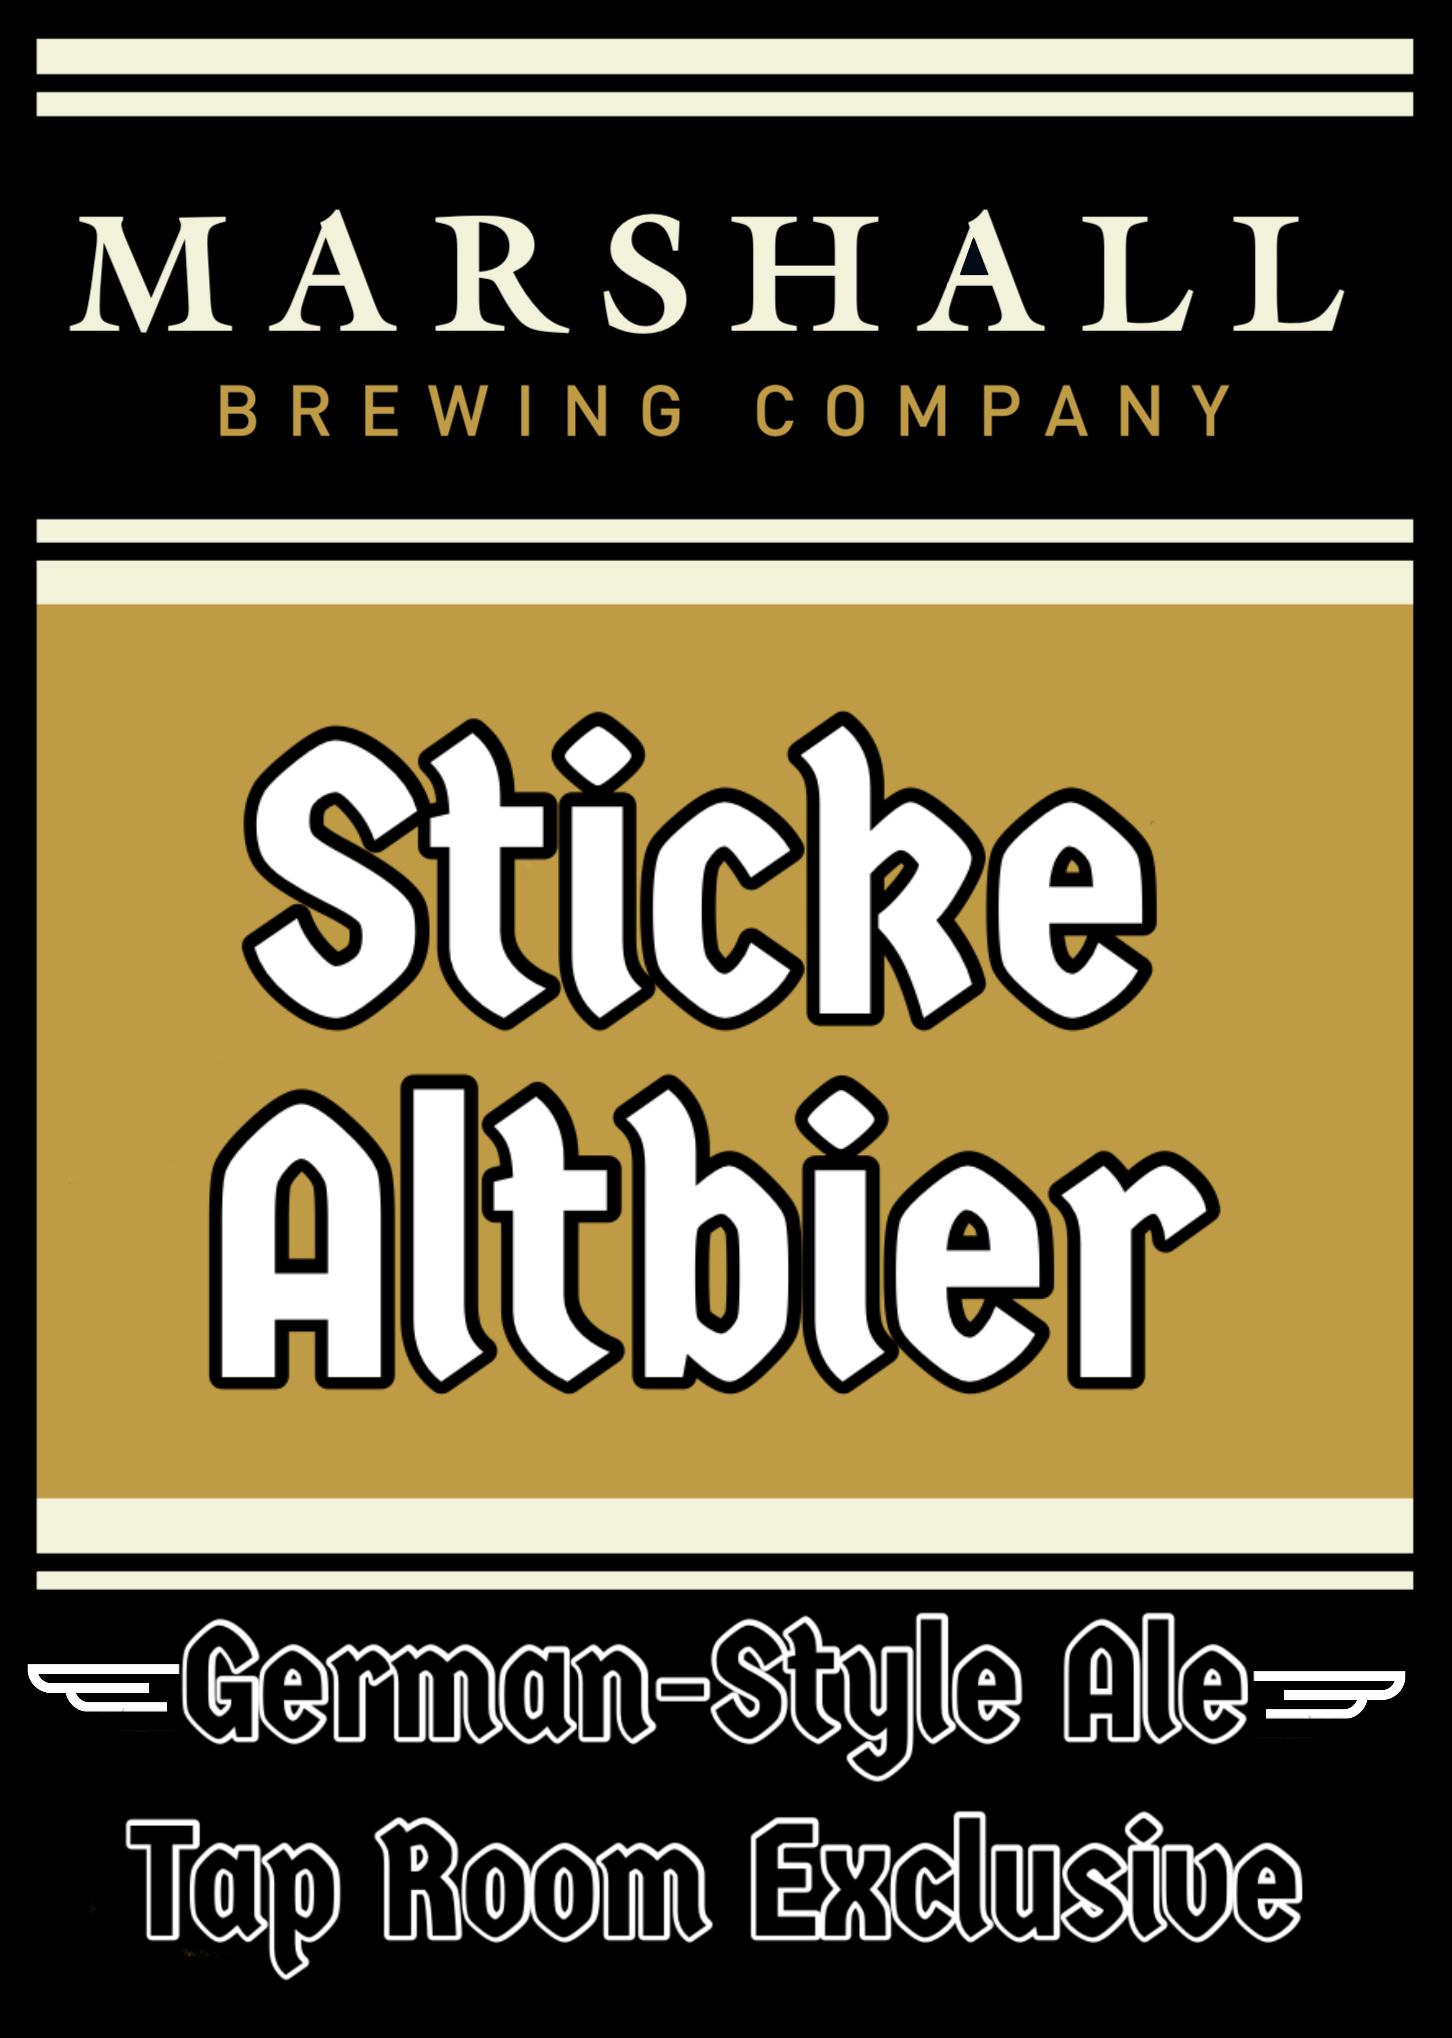 Sticke Altbier